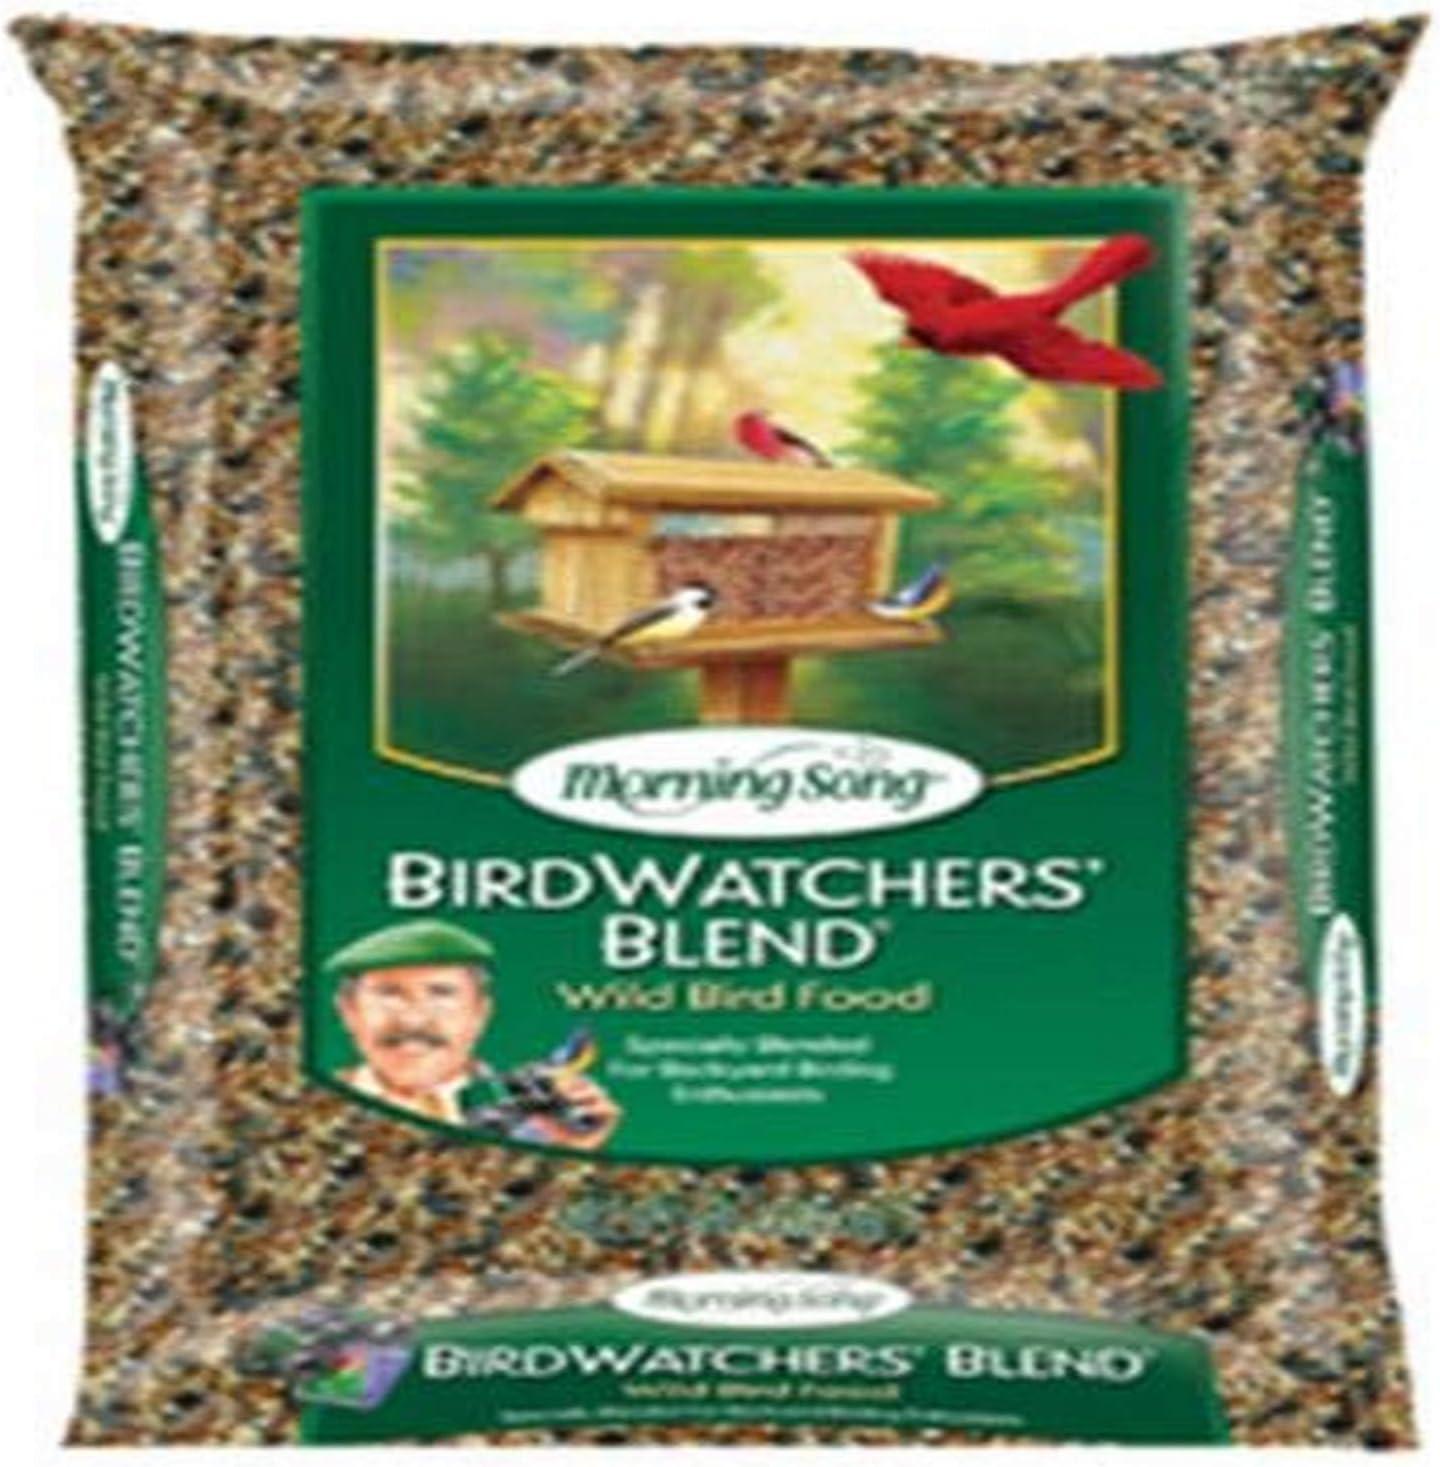 Morning Song 11956 Birdwatchers Blend-Wild Bird Food, 18-Pound